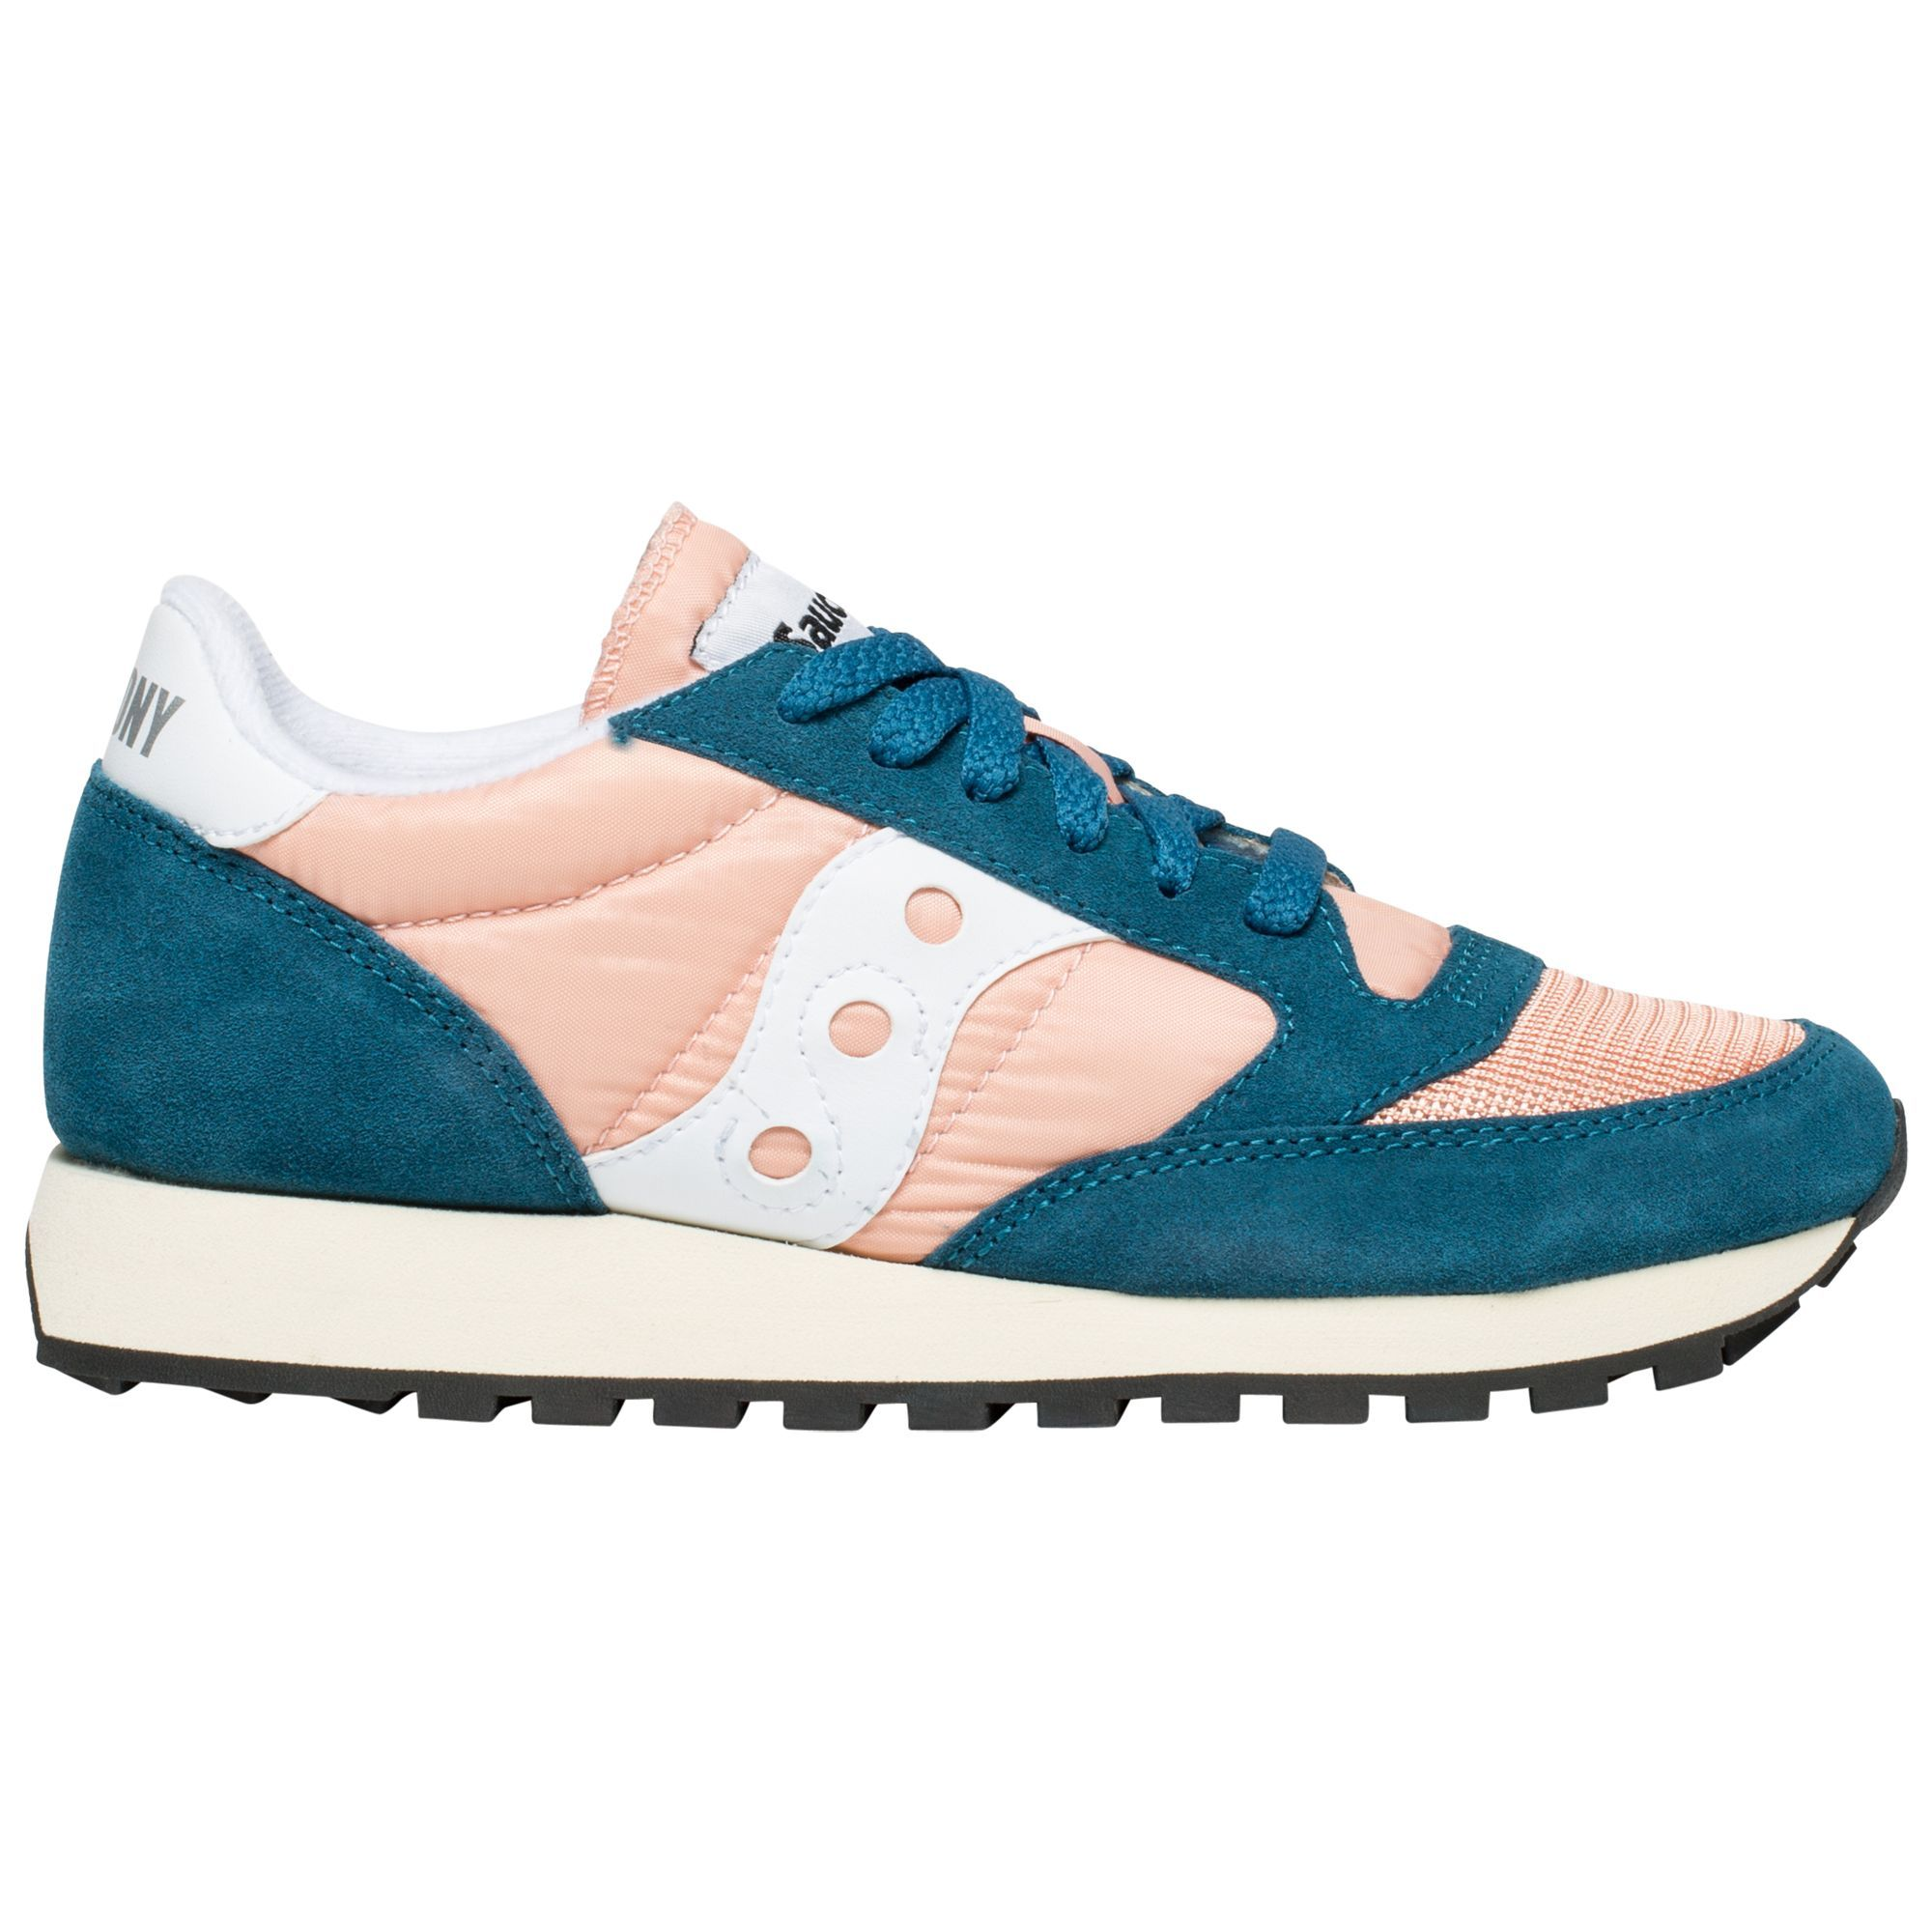 Vintage shoes women, Trainers women